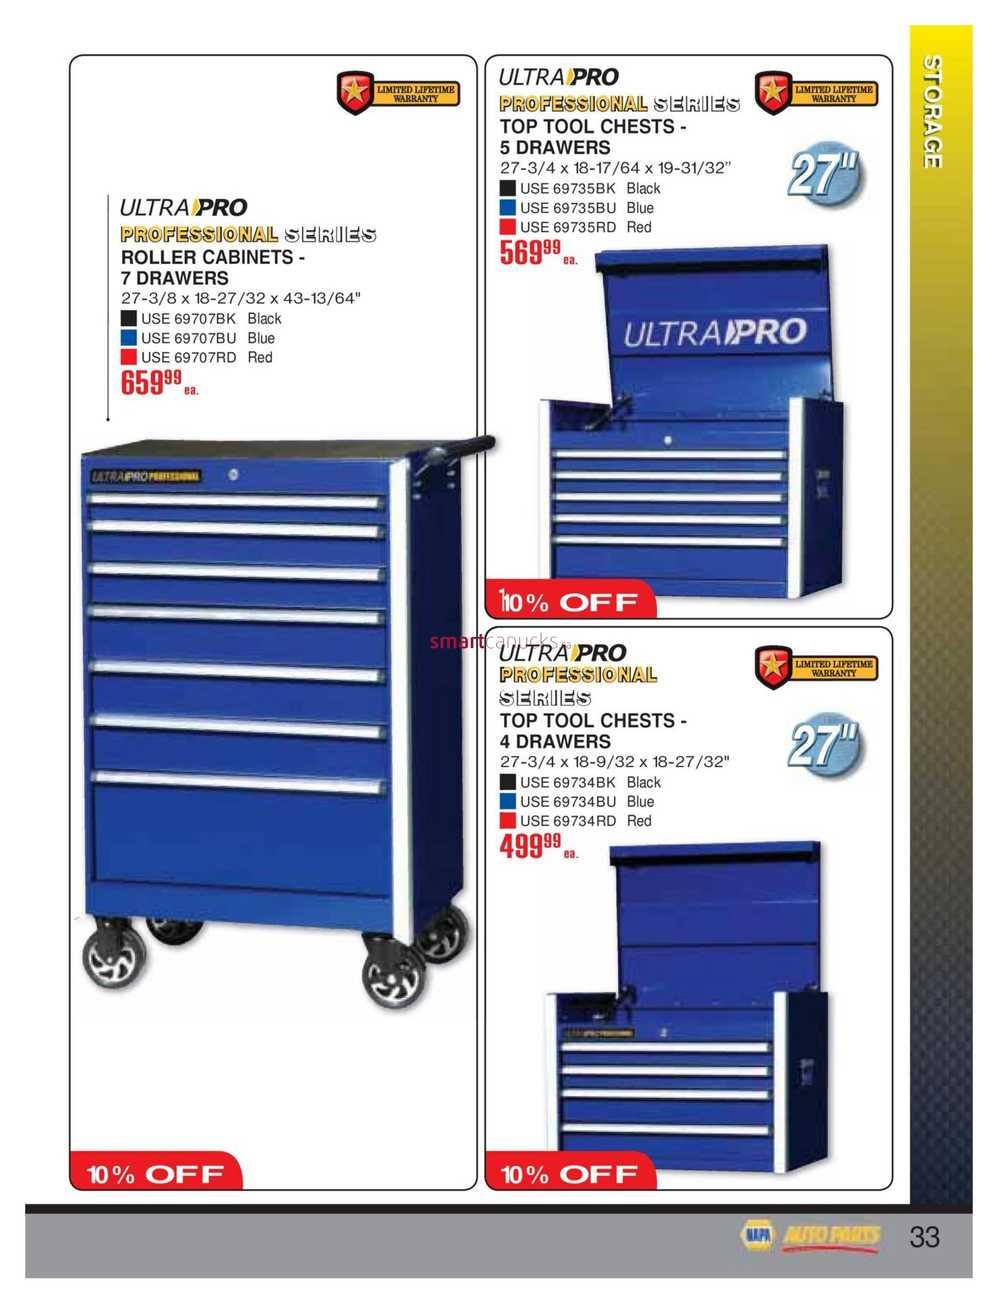 NAPA Auto Parts Real Deals Catalogue March 1 to April 30